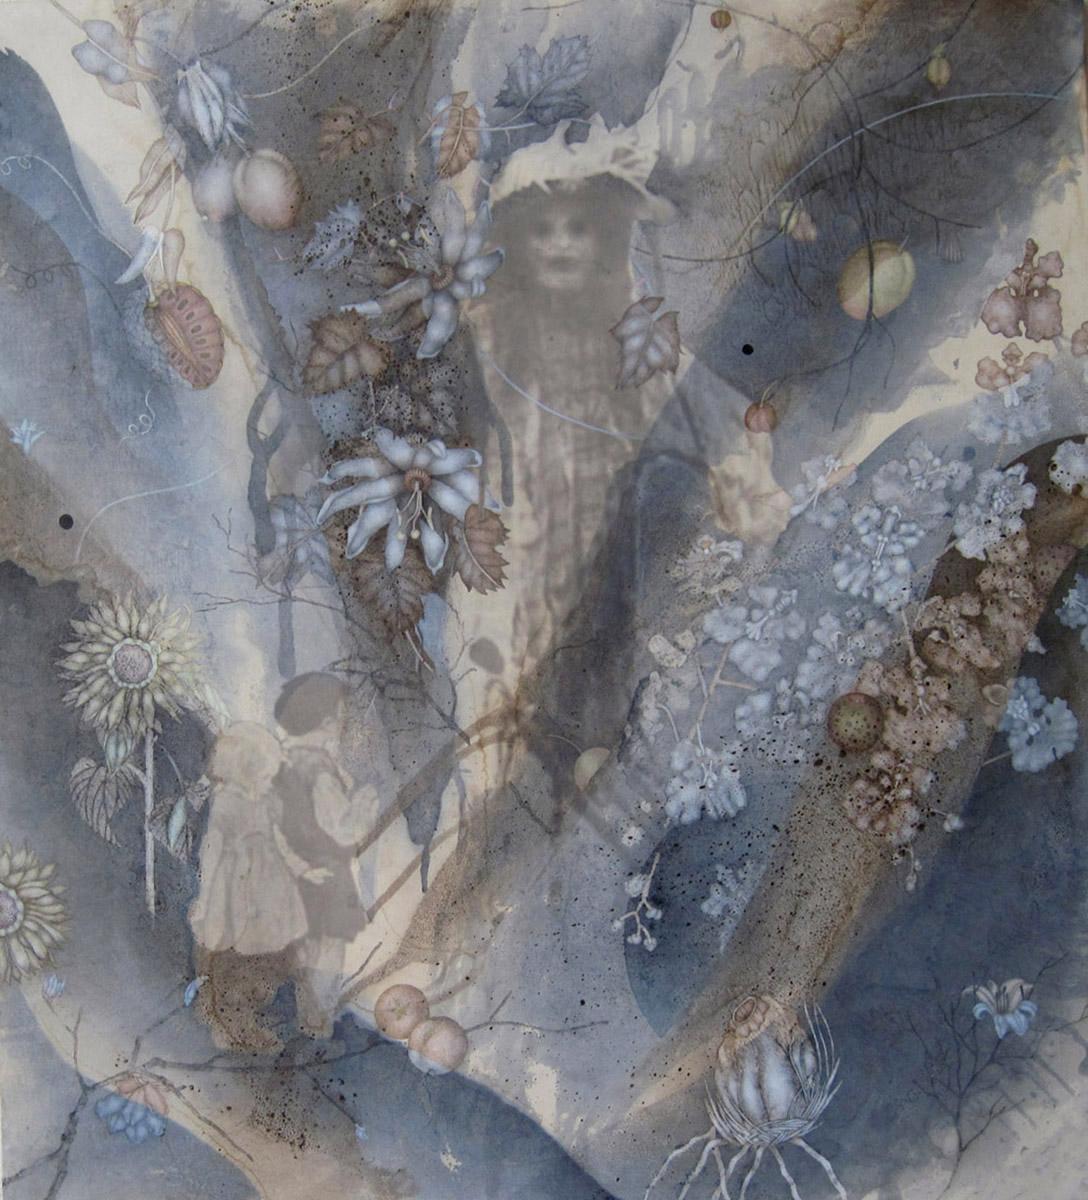 "Autumn Gethsemane (2011), 42"" x 38"", Oil, asphaltum, encaustic,and inkjet on Okawara Paper, mounted on canvas"